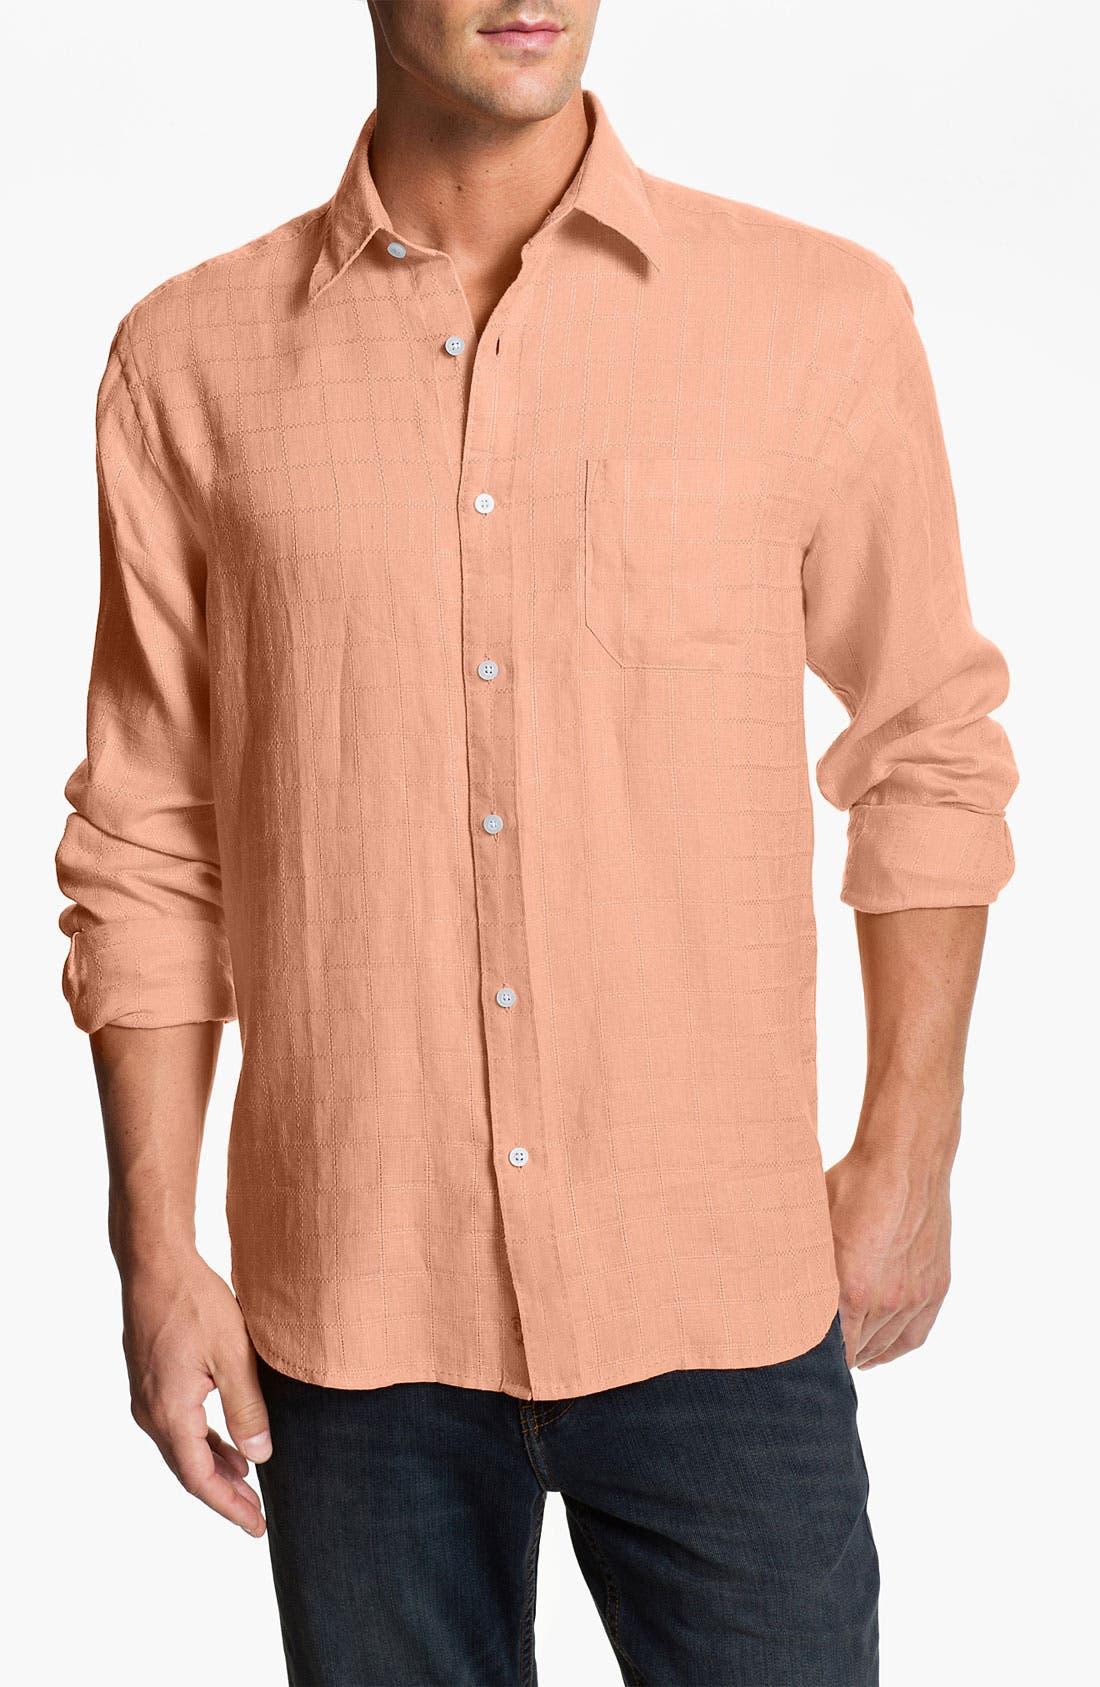 Alternate Image 1 Selected - Tommy Bahama 'Costa Sera' Linen Sport Shirt (Big & Tall)